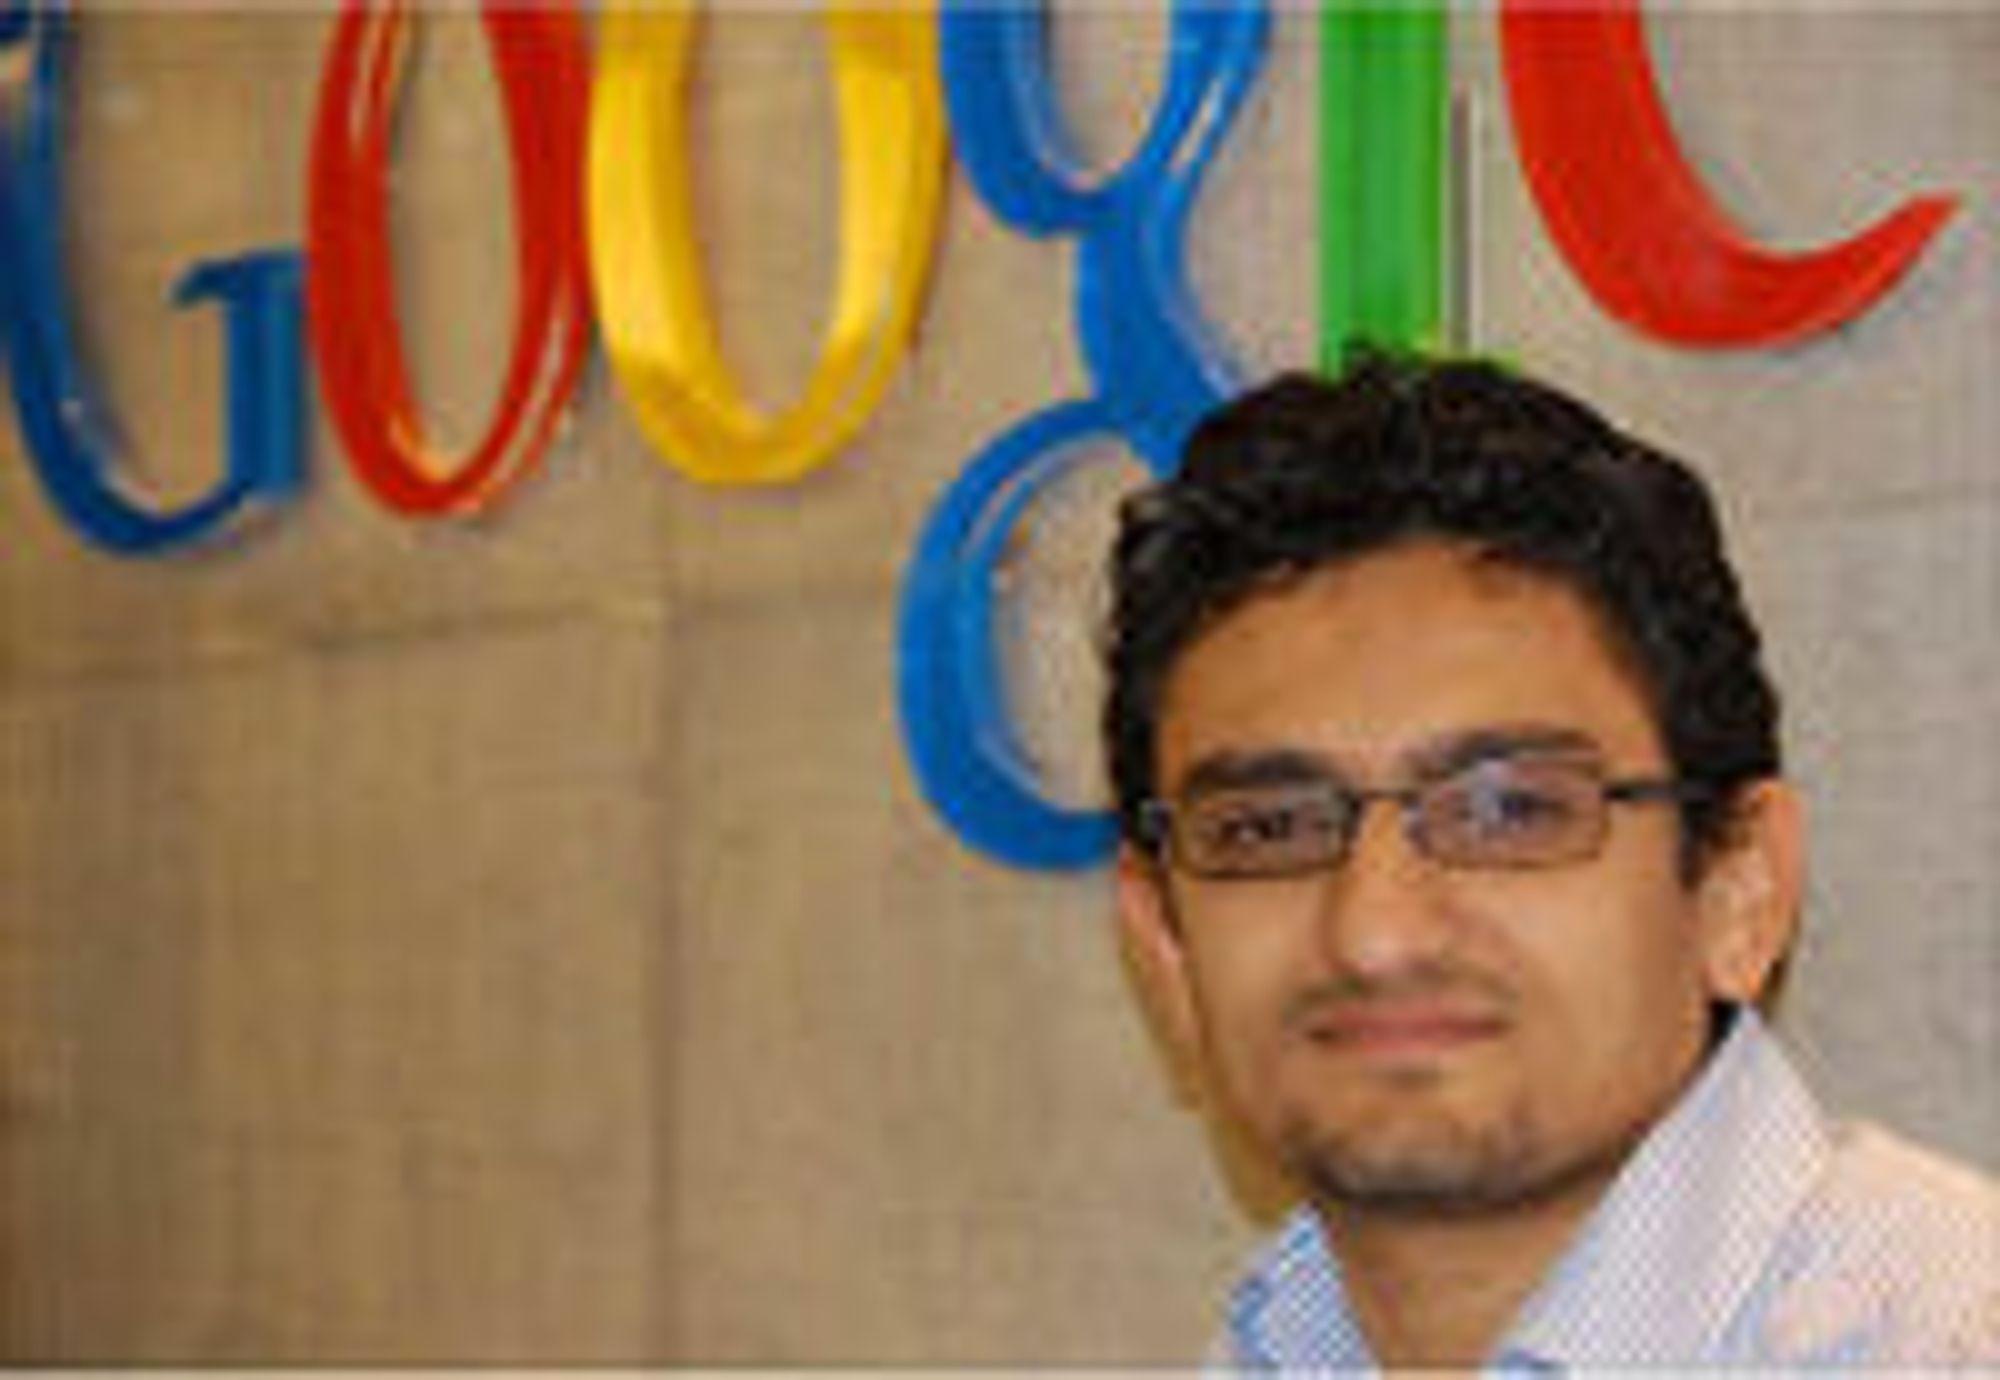 Savnet: Googles markedssjef Wael Ghonim. Bilder er hentet fra hans Facebook-profil.